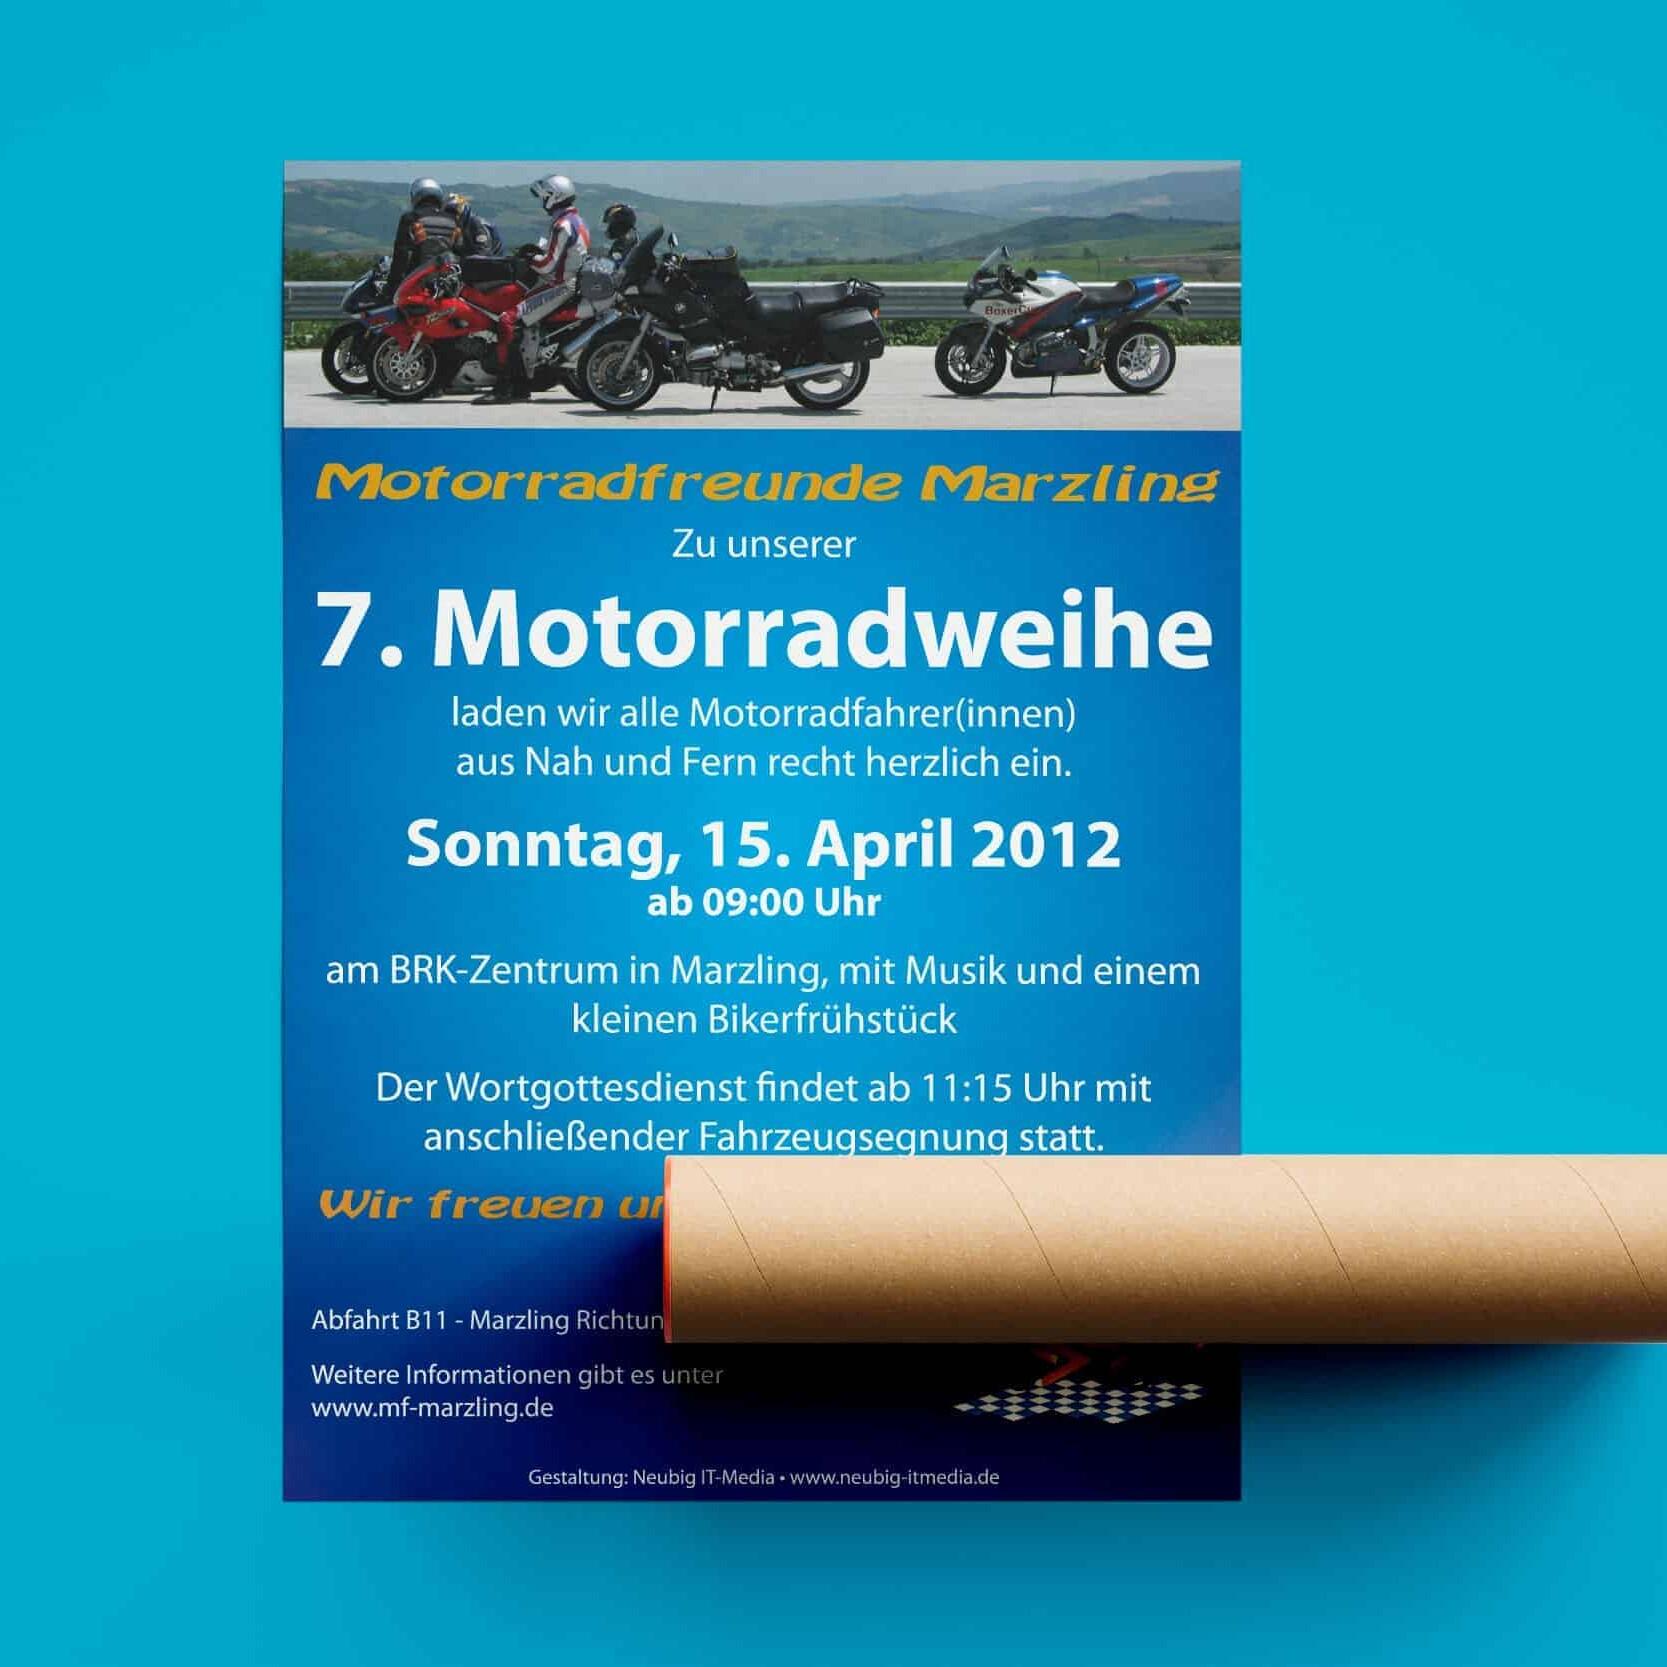 Plakat Motorradfreunde Marzling